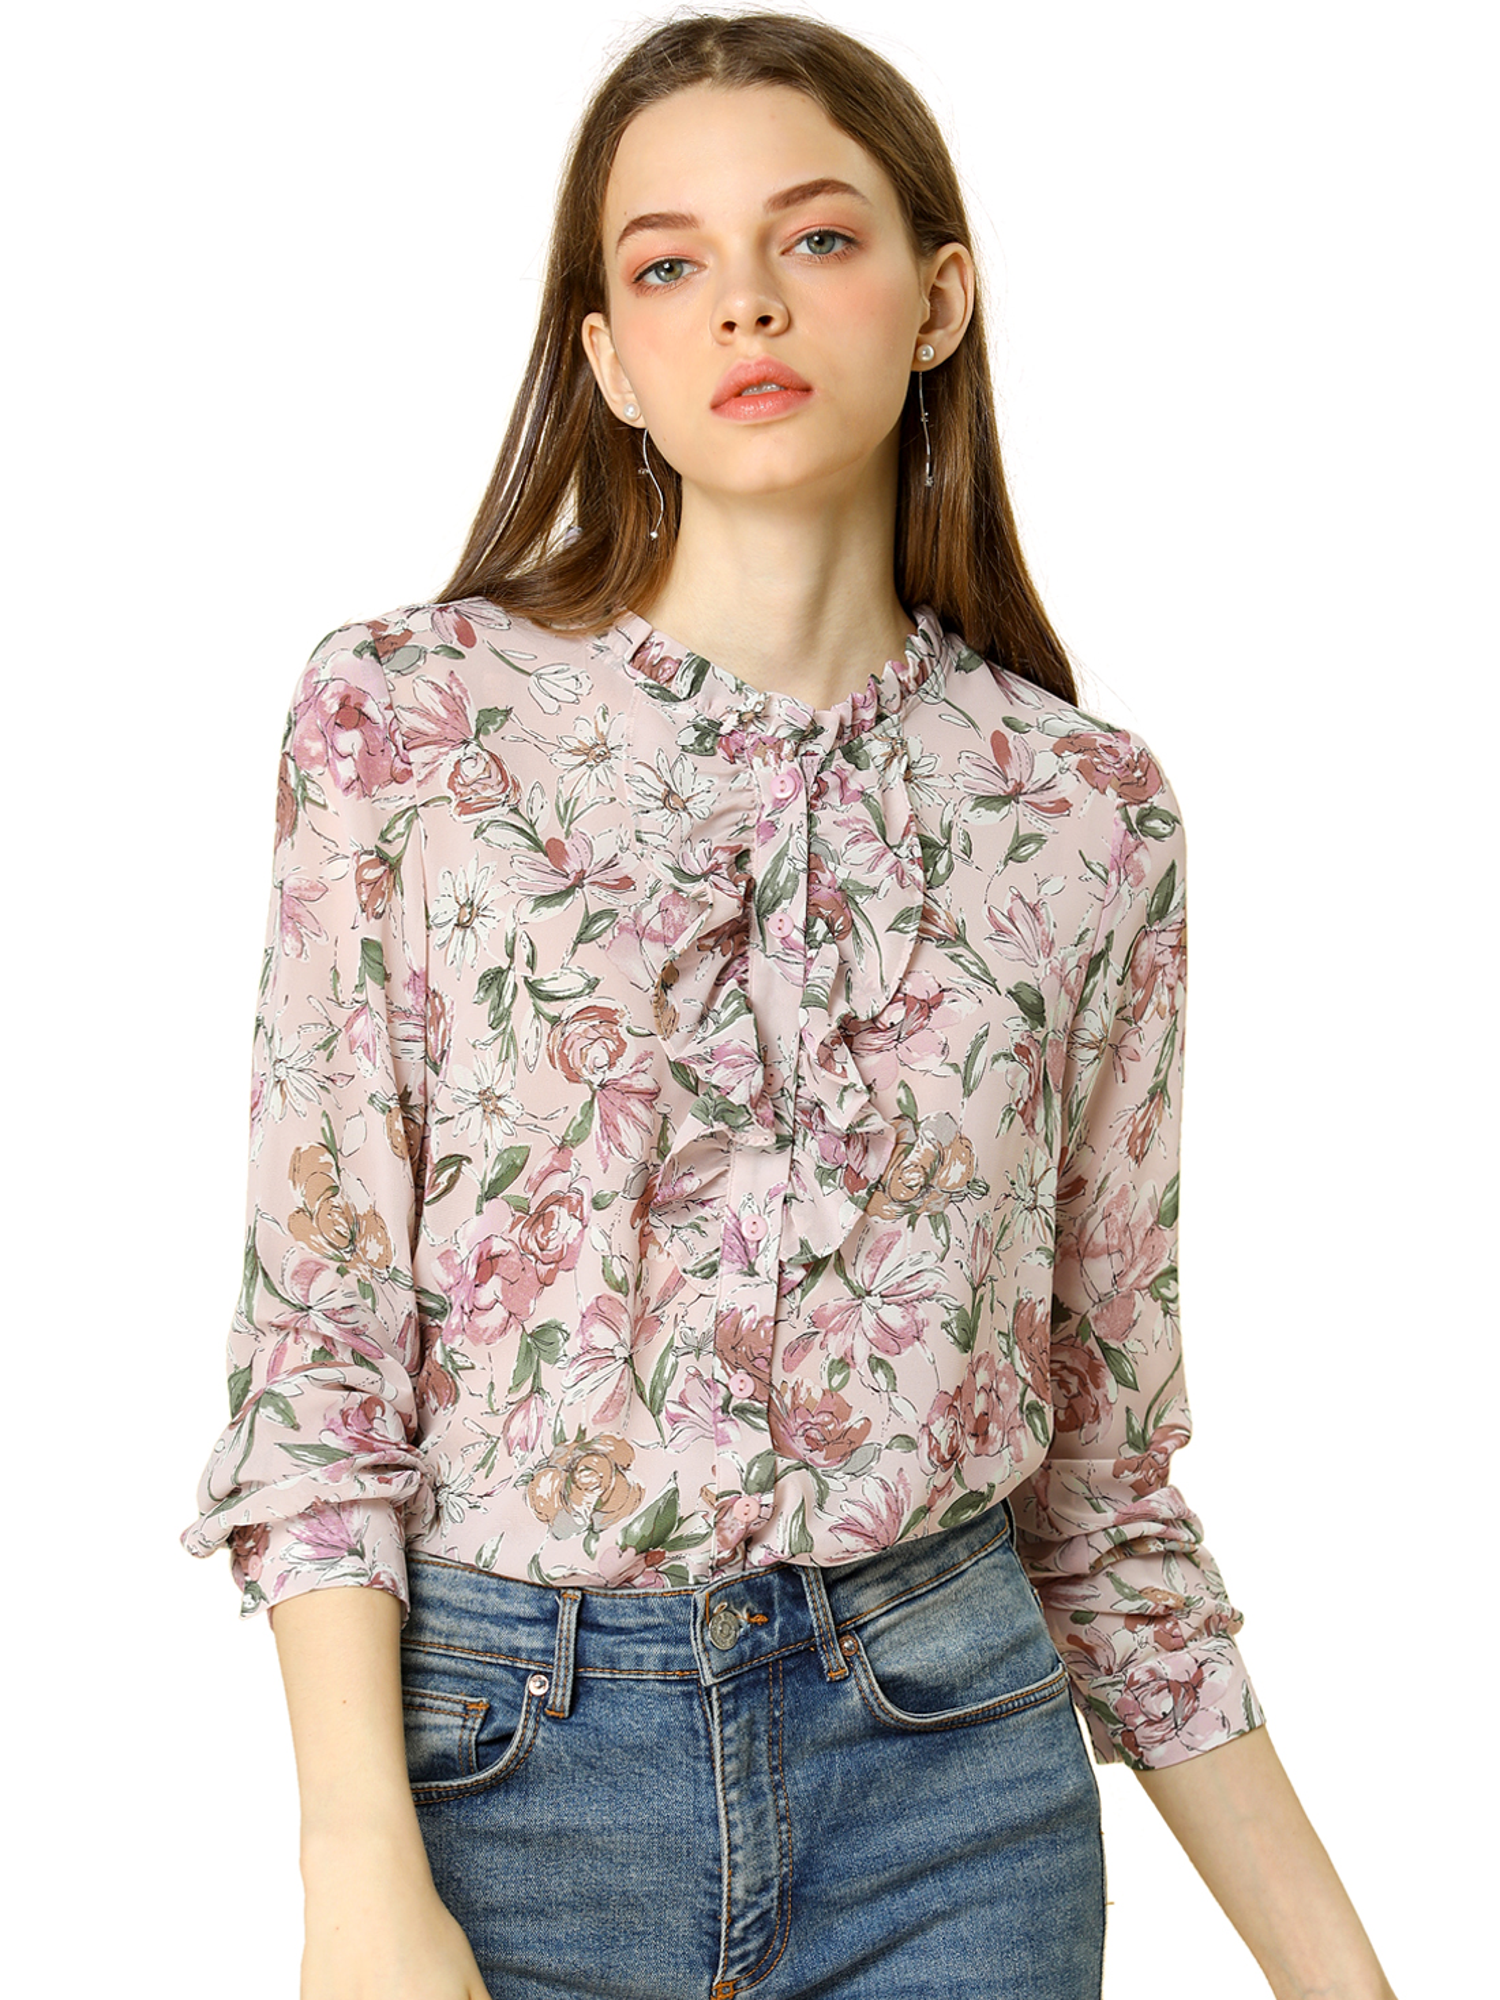 Women's Long Sleeve Ruffle Collar Button Down Floral Shirt Pink XS (US 2)